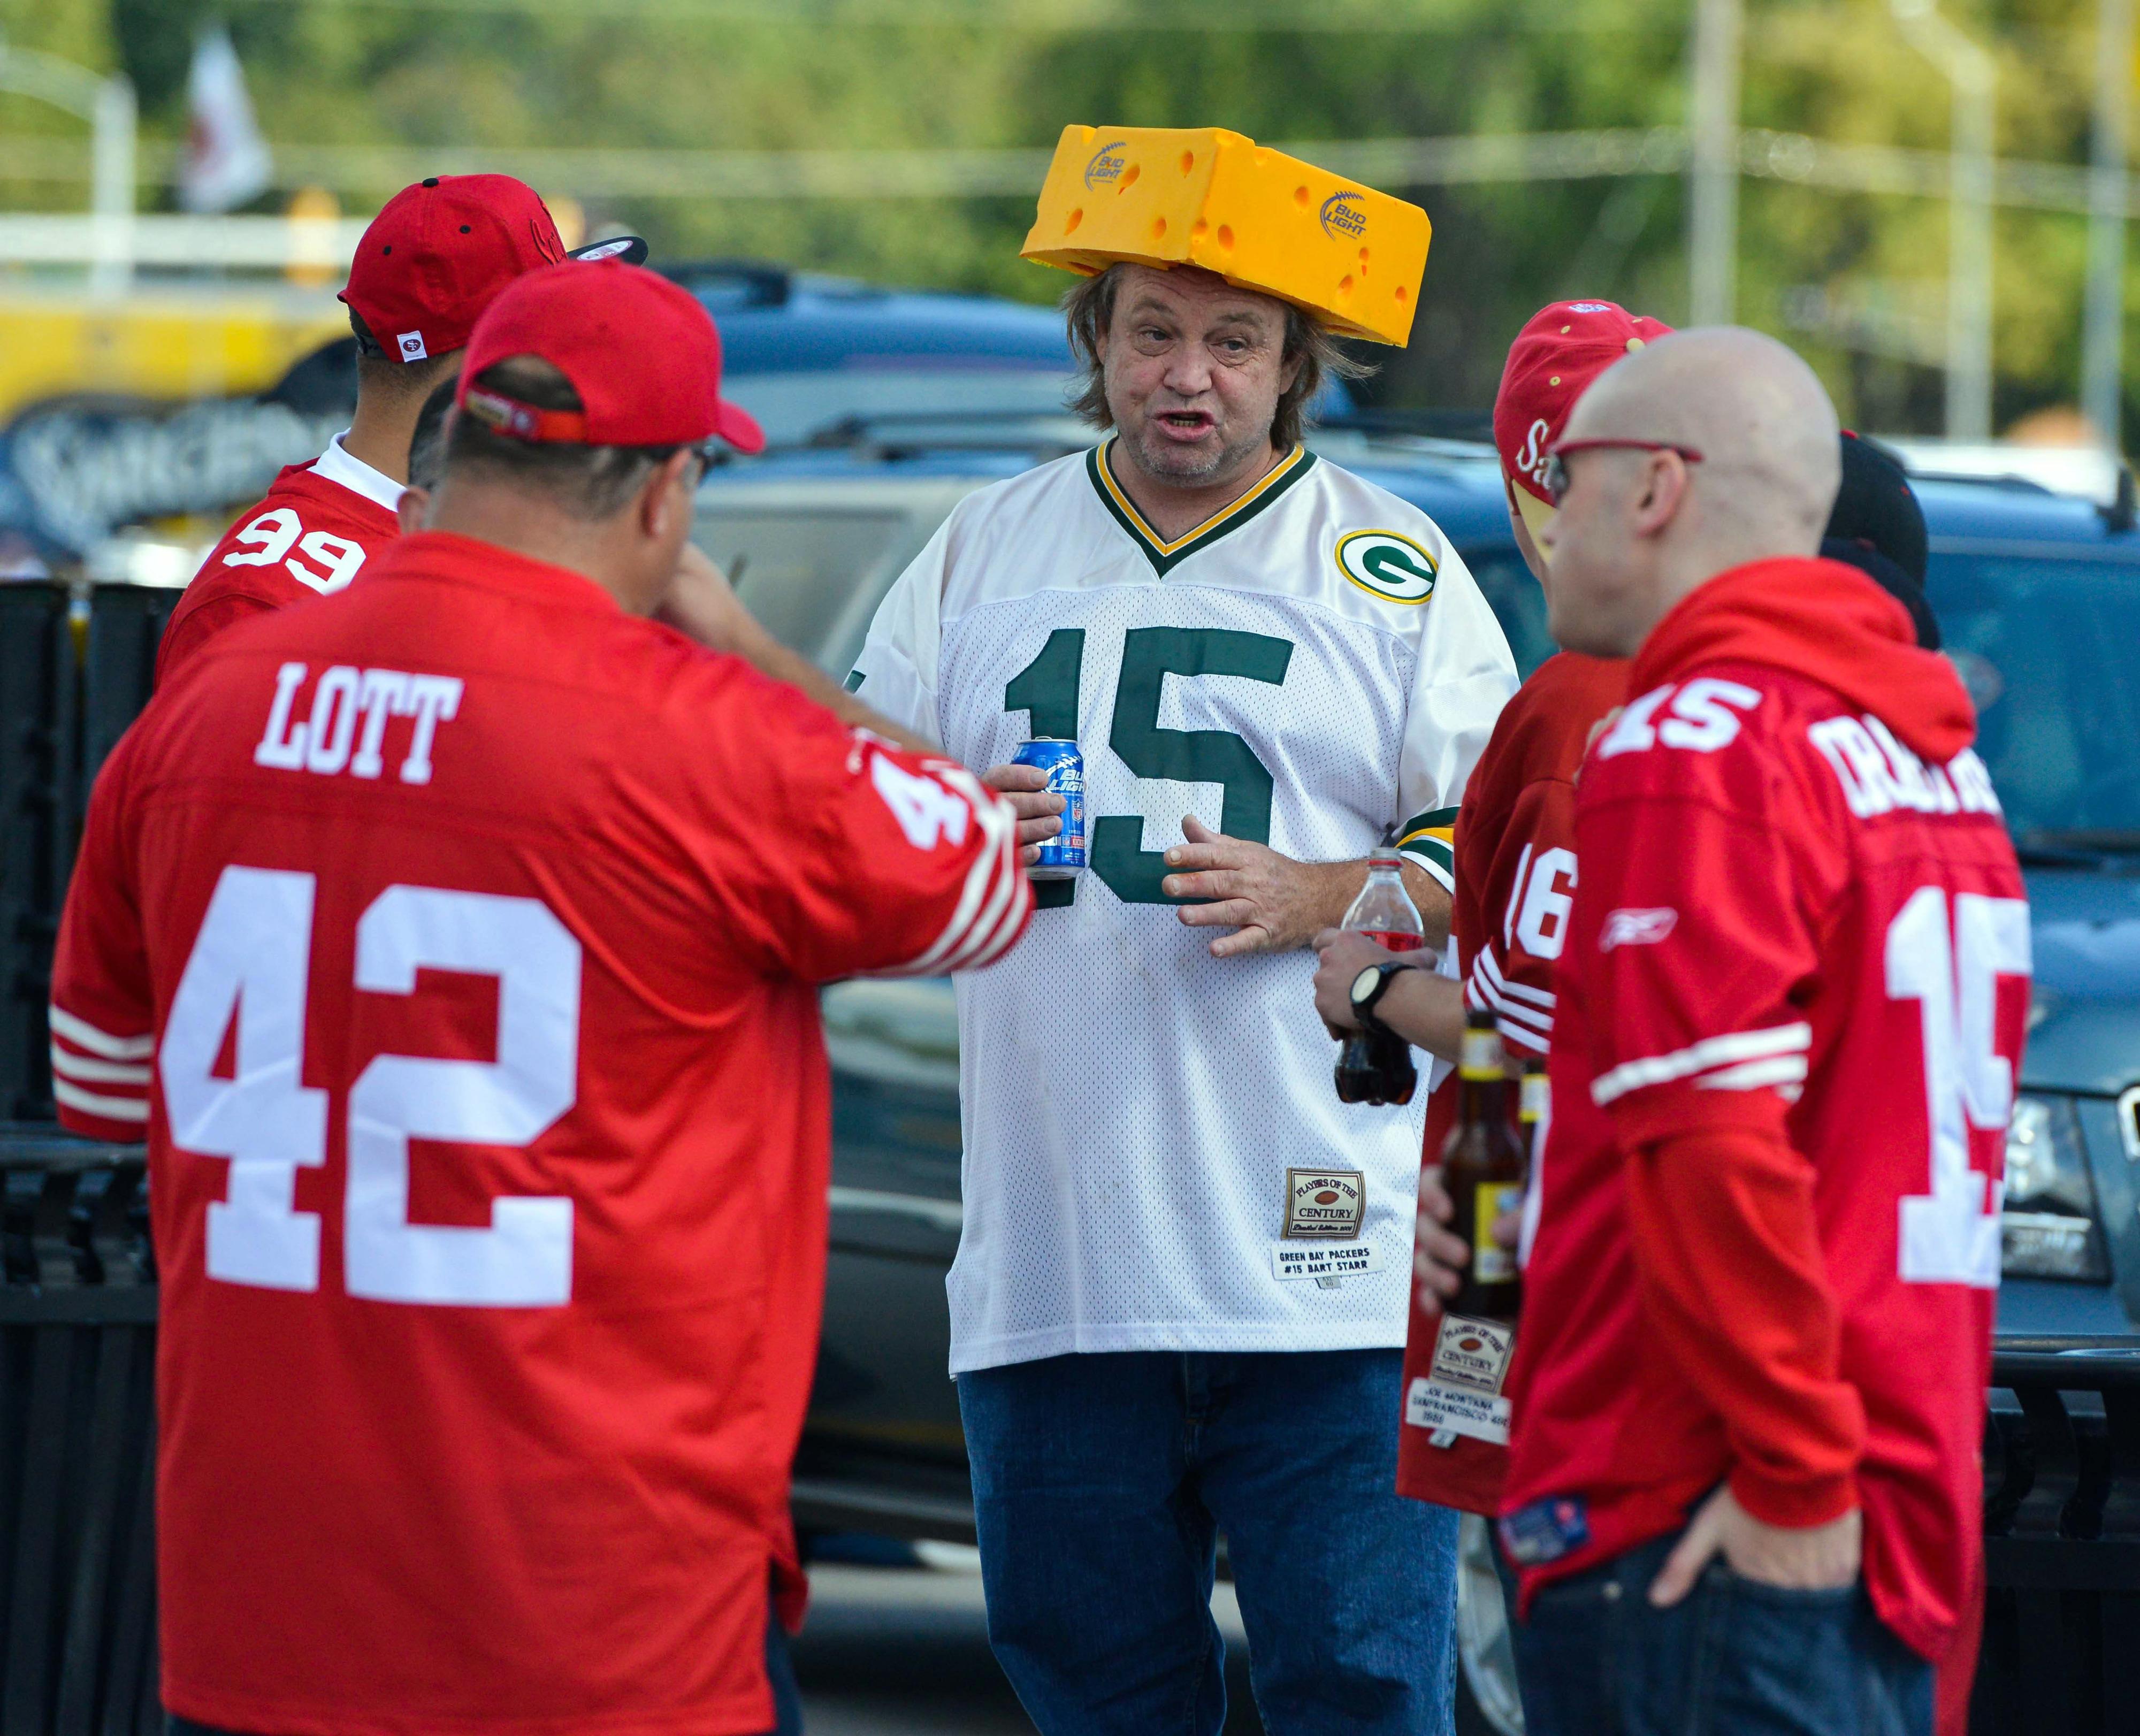 Sept 9, 2012; Green Bay, WI, USA;  Green Bay Packers fan Mike Kukielka (center) meets San Francisco 49ers fans before game at Lambeau Field.  Mandatory Credit: Benny Sieu-US PRESSWIRE